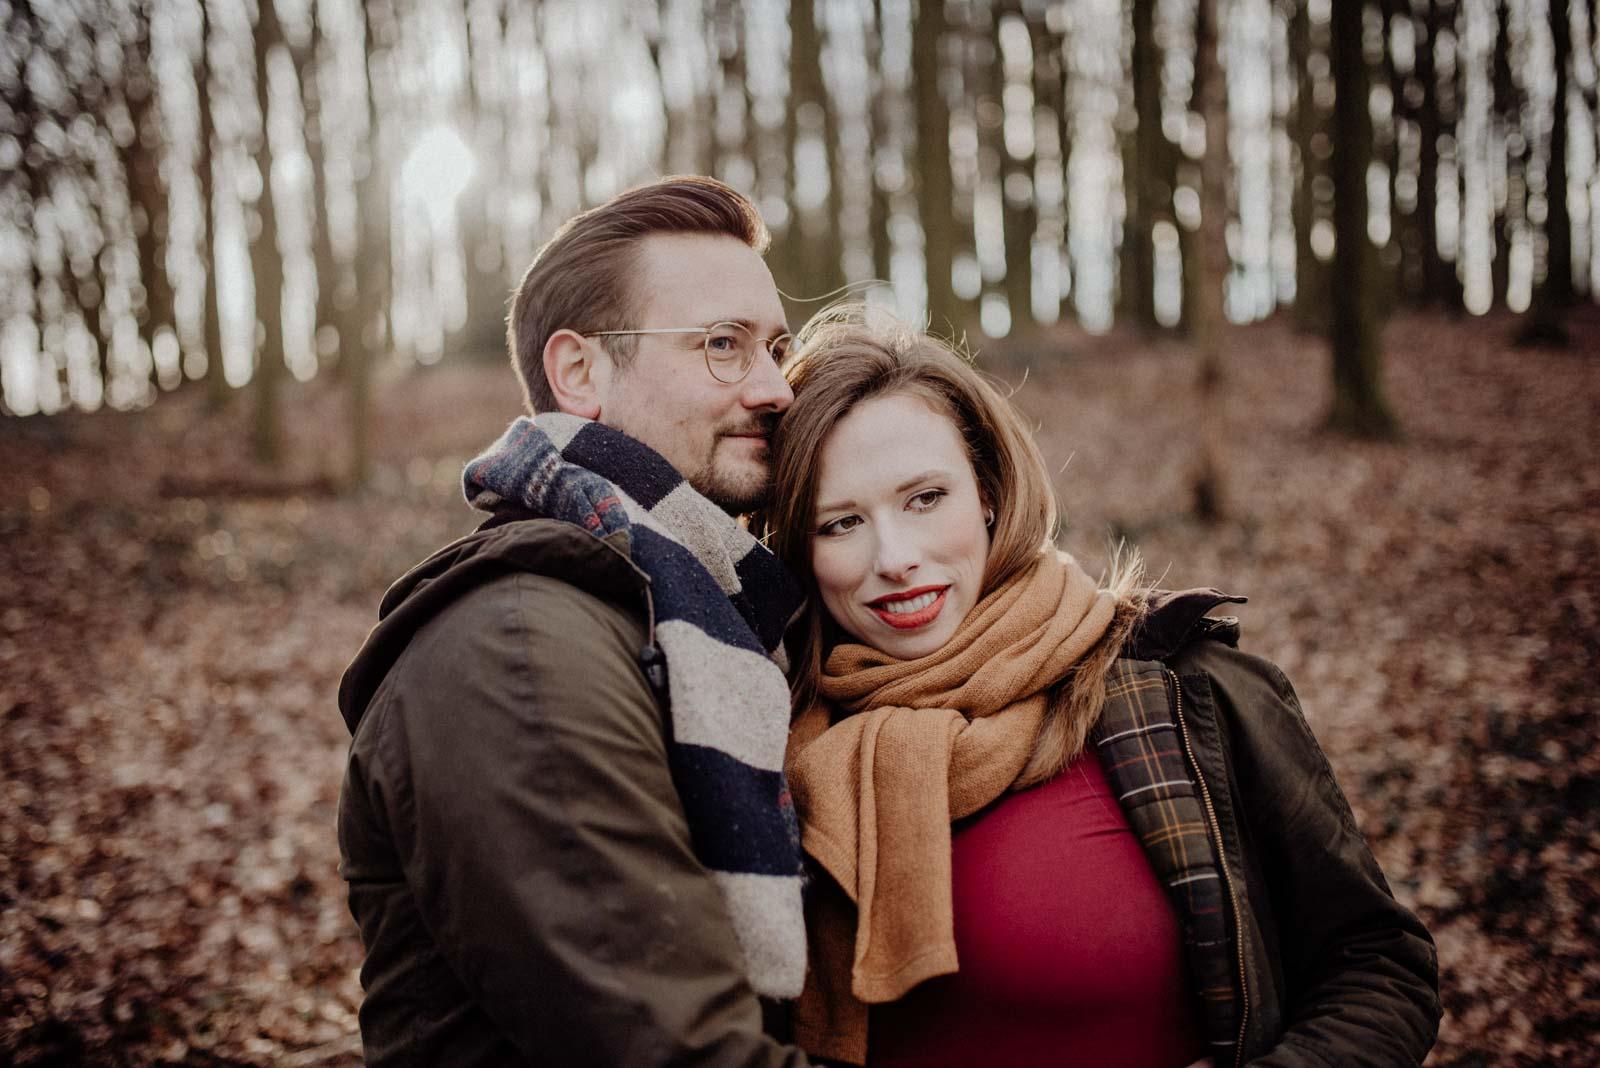 026-Babybauch-Shooting-Wald-Natur-Witten-Familienfotografie-Familienfotos